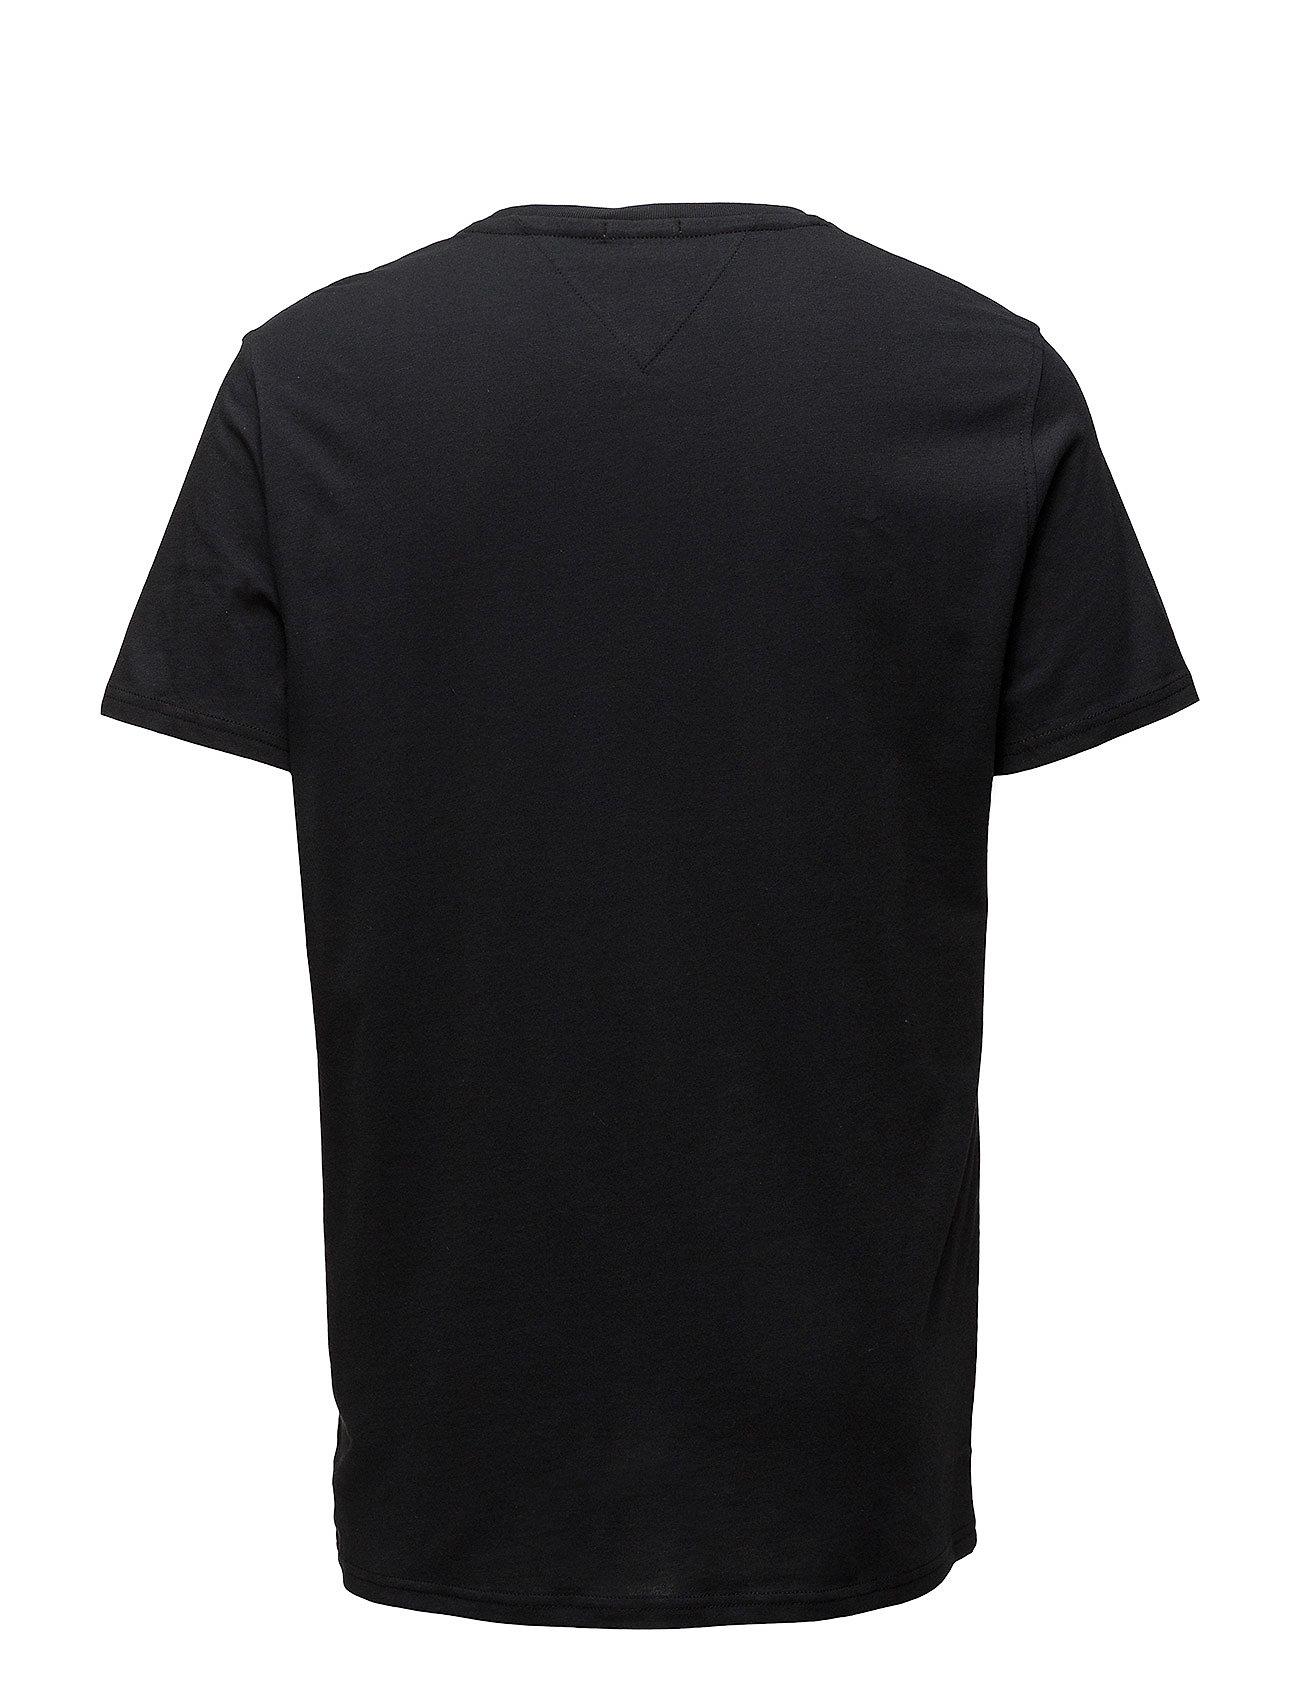 Tommy Jeans - TJM ORIGINAL JERSEY TEE - basic t-shirts - tommy black - 1